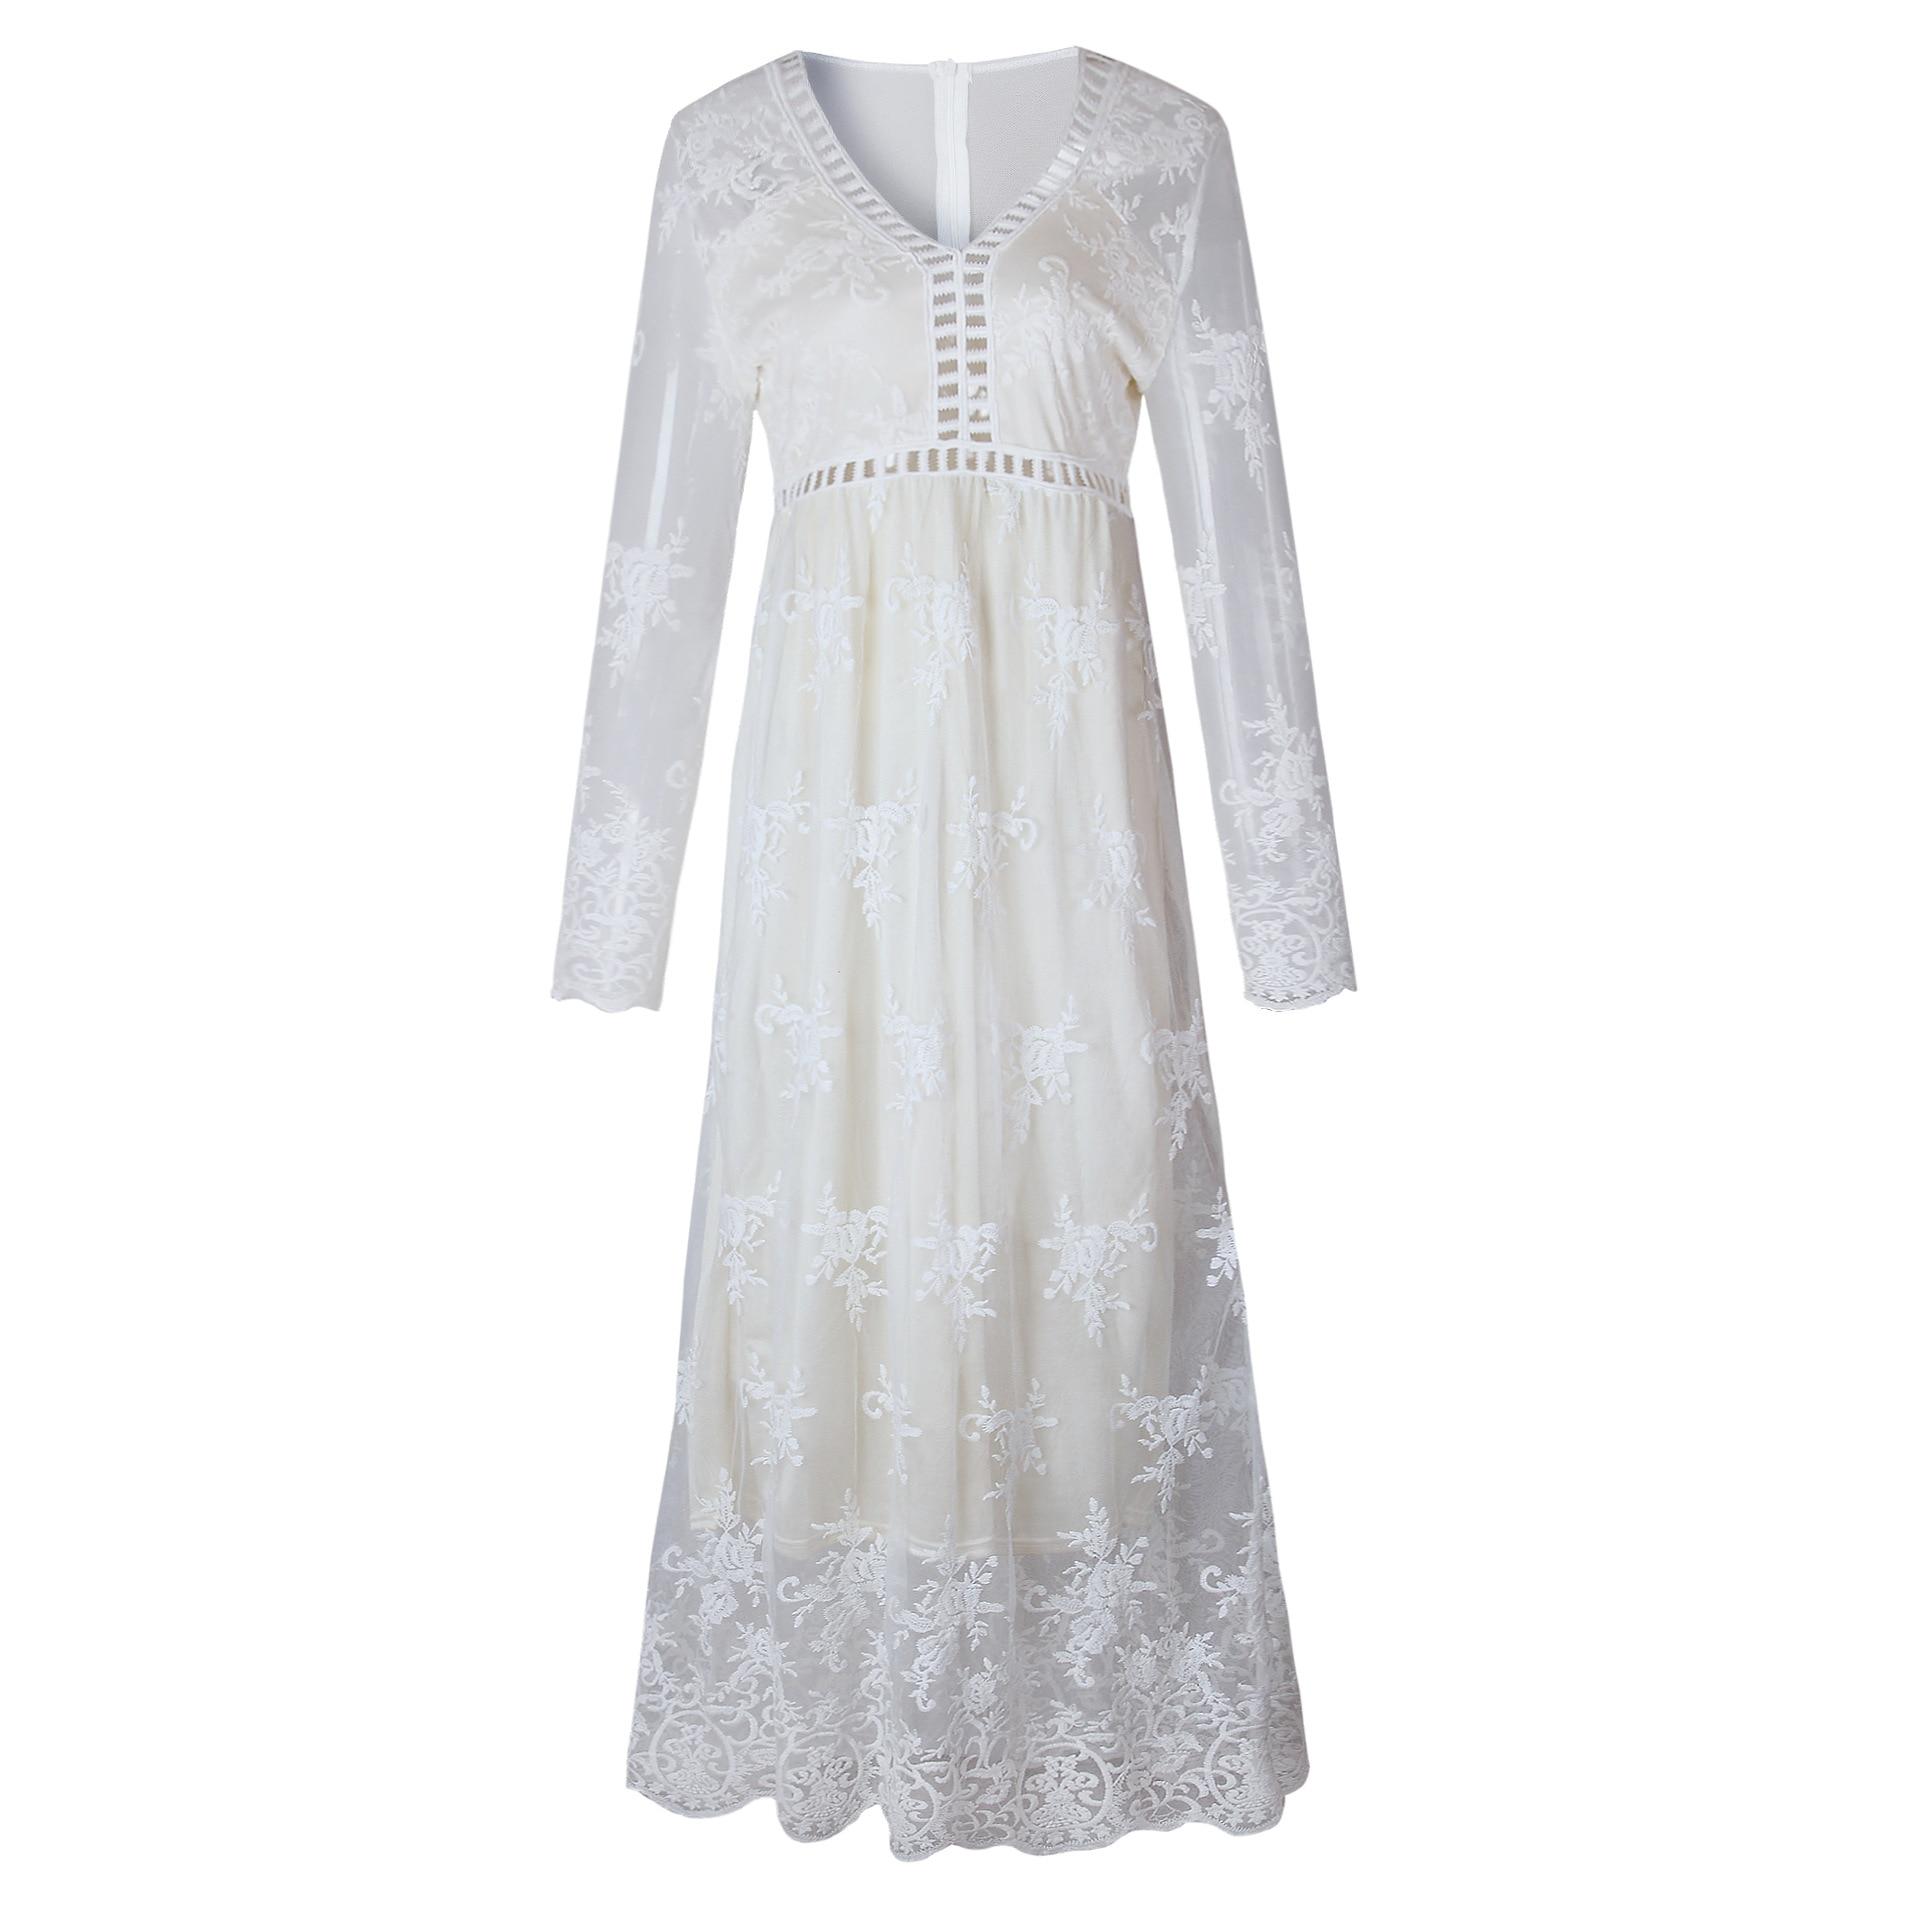 LAISIYI White Lace Embroidery Maxi Dress Long Sleeve Elegant Party ... 5e1e258d90c8